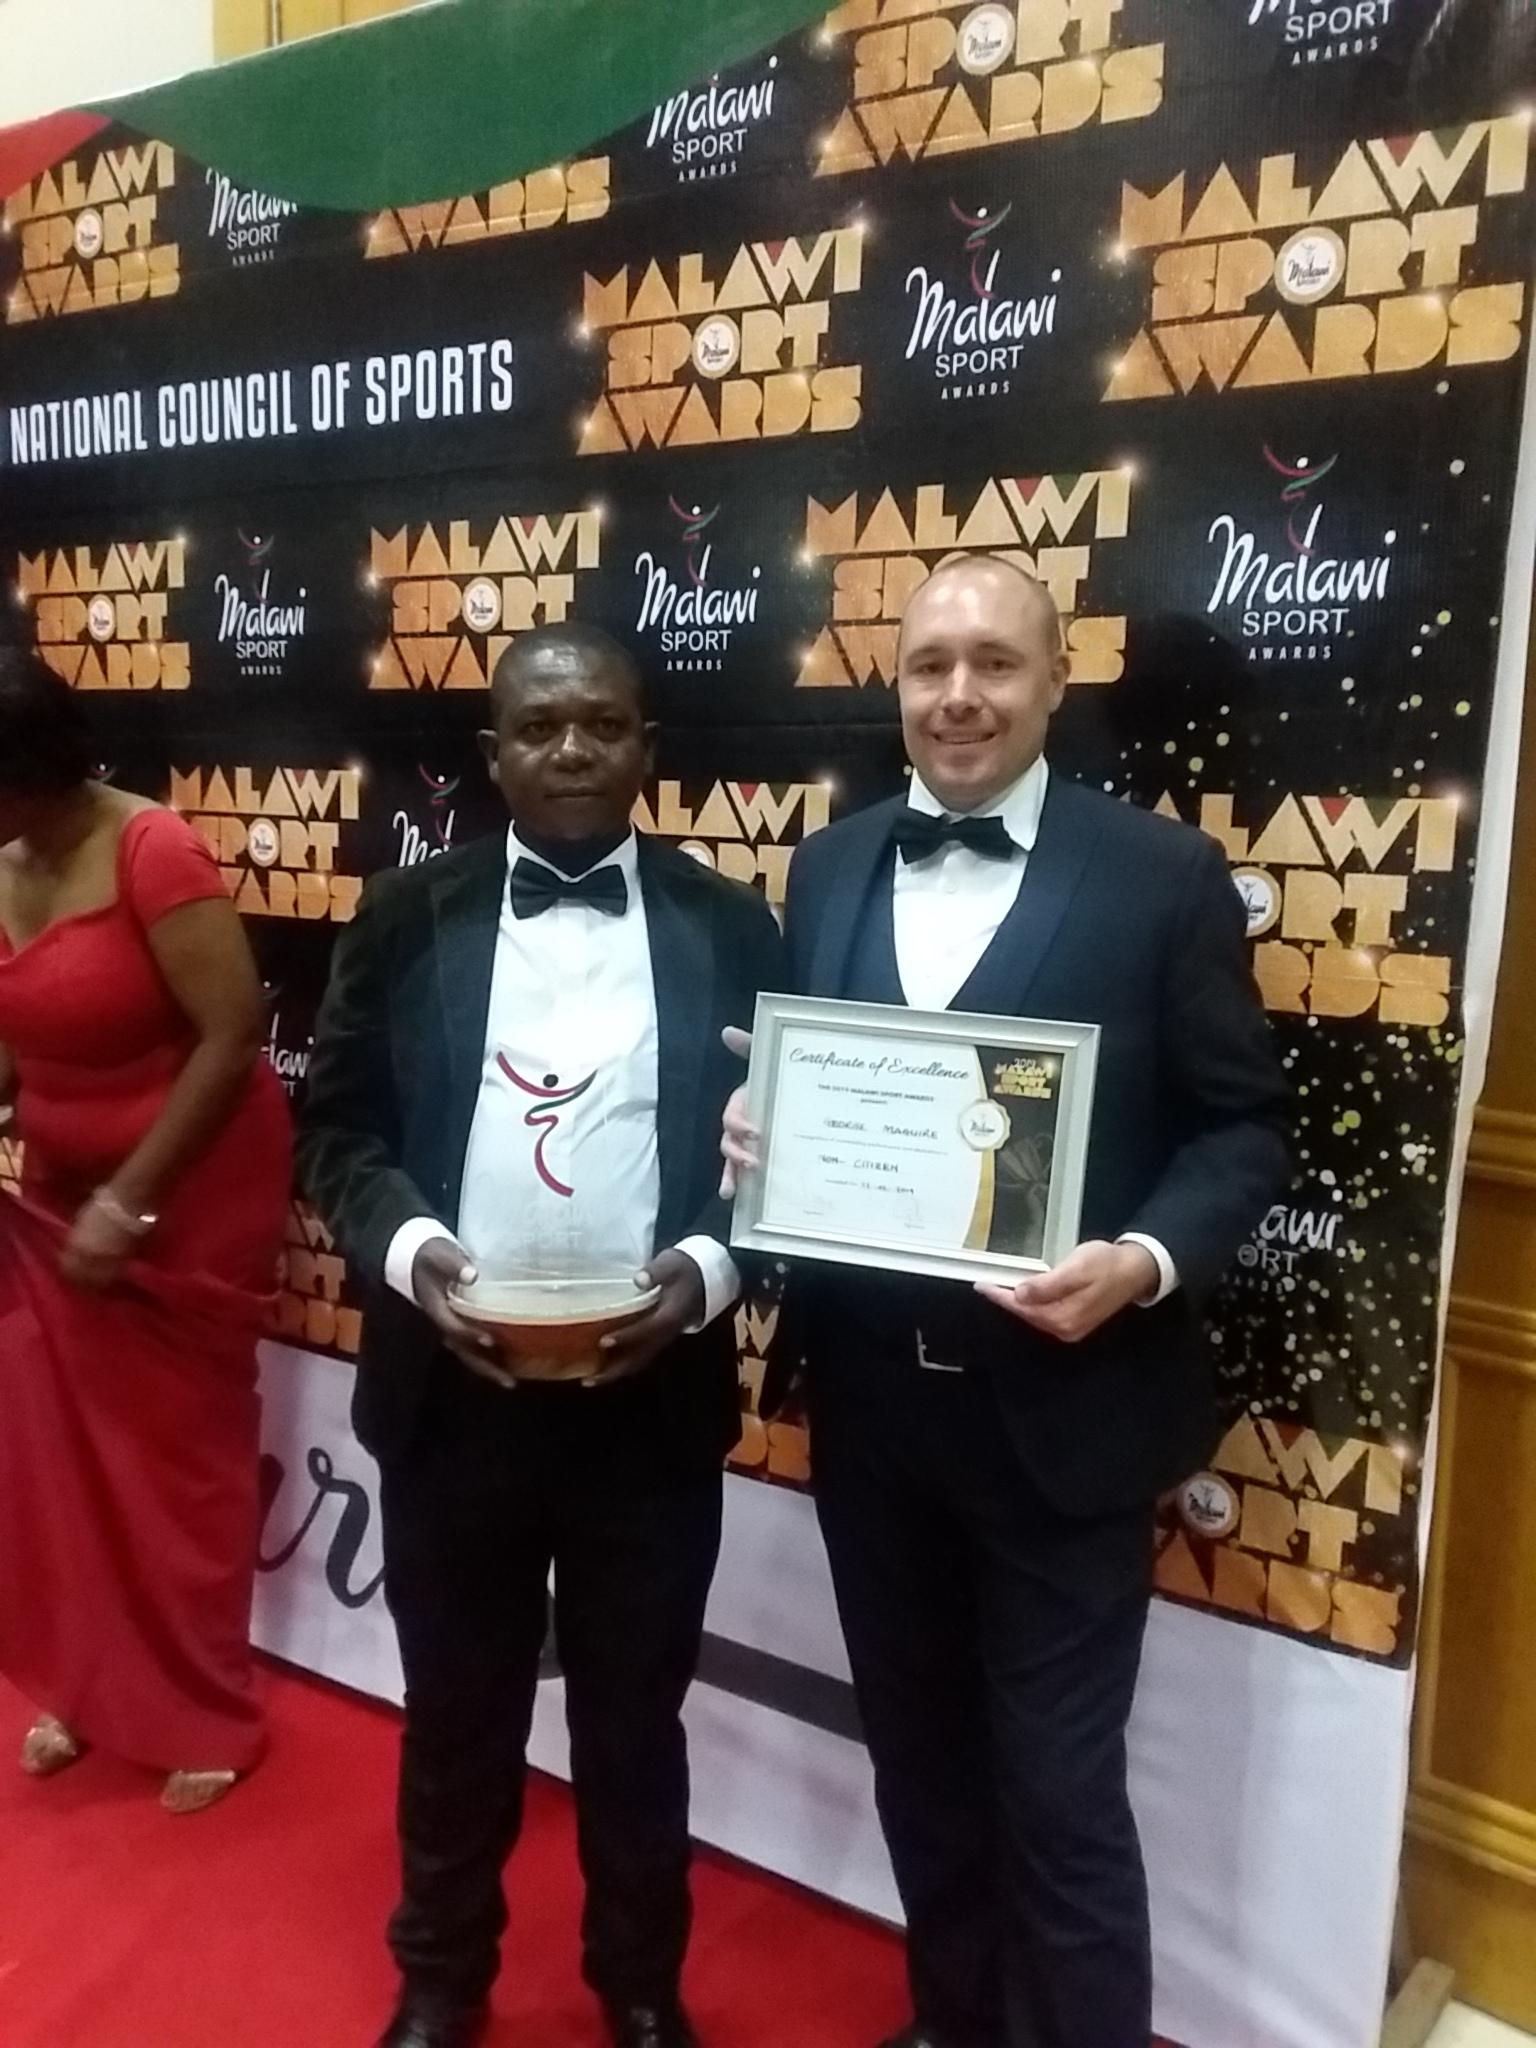 Award Winning Program   Malawi 2019 Sports Awards